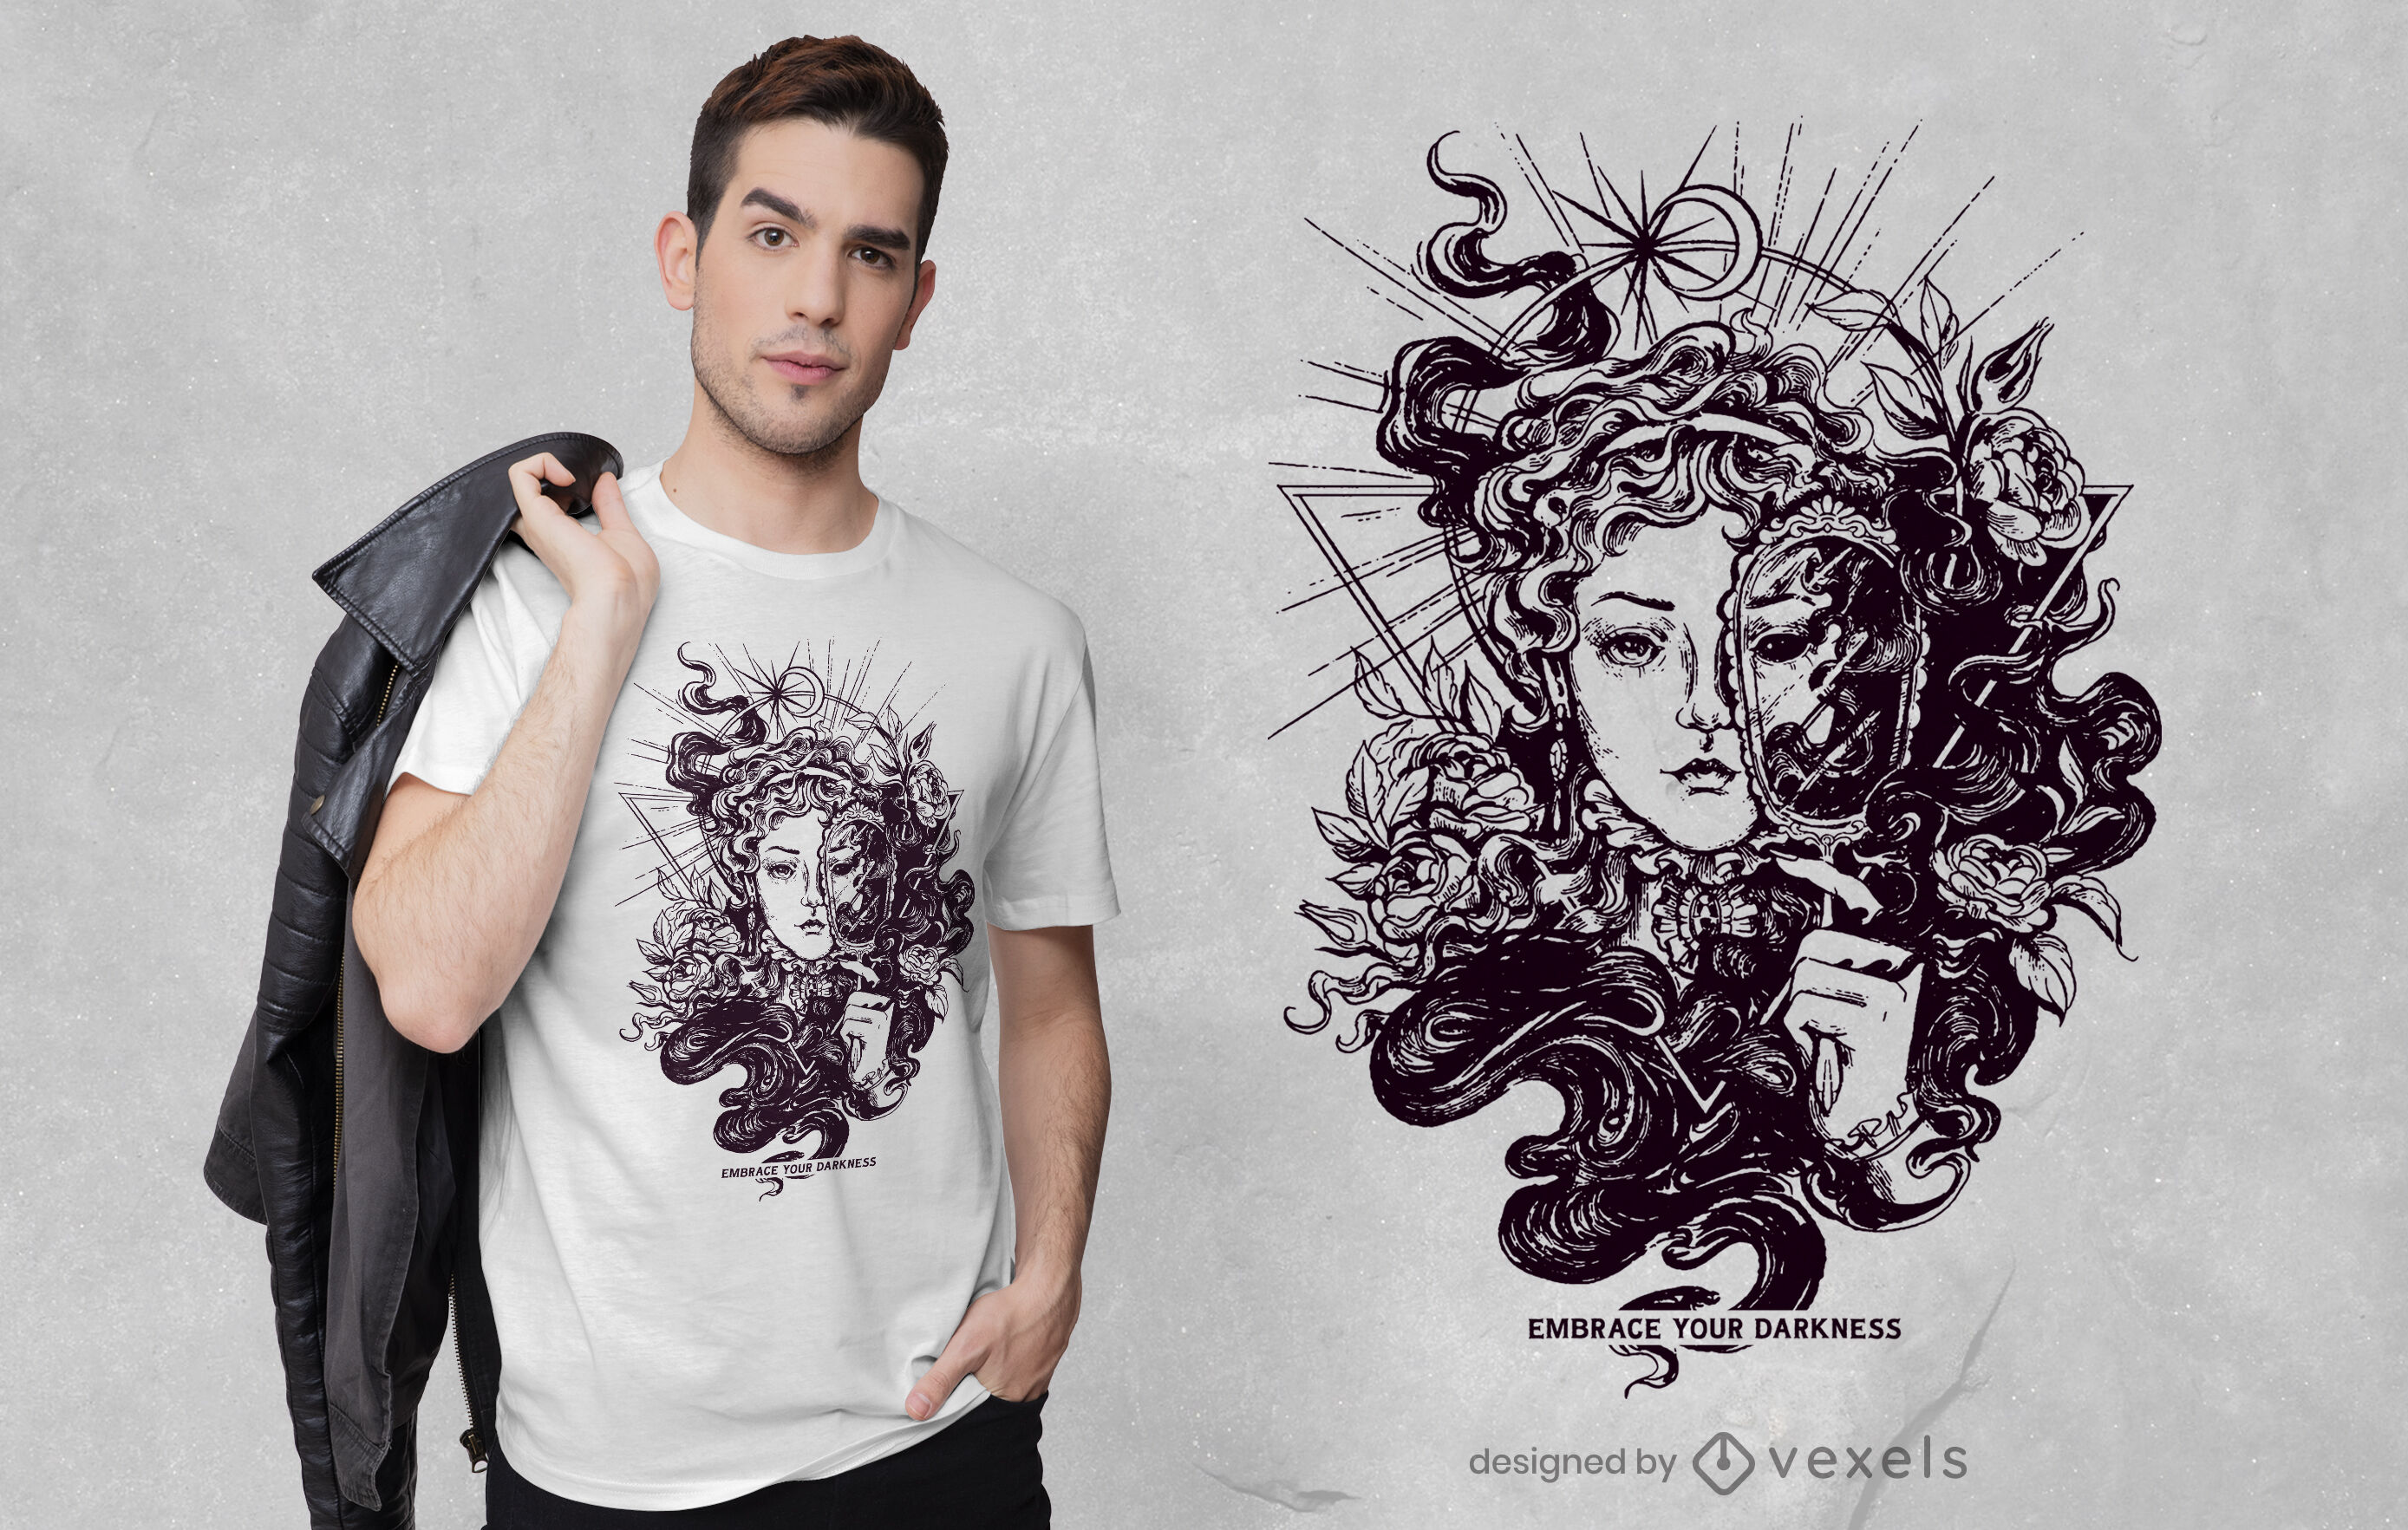 Lady darkness t-shirt design